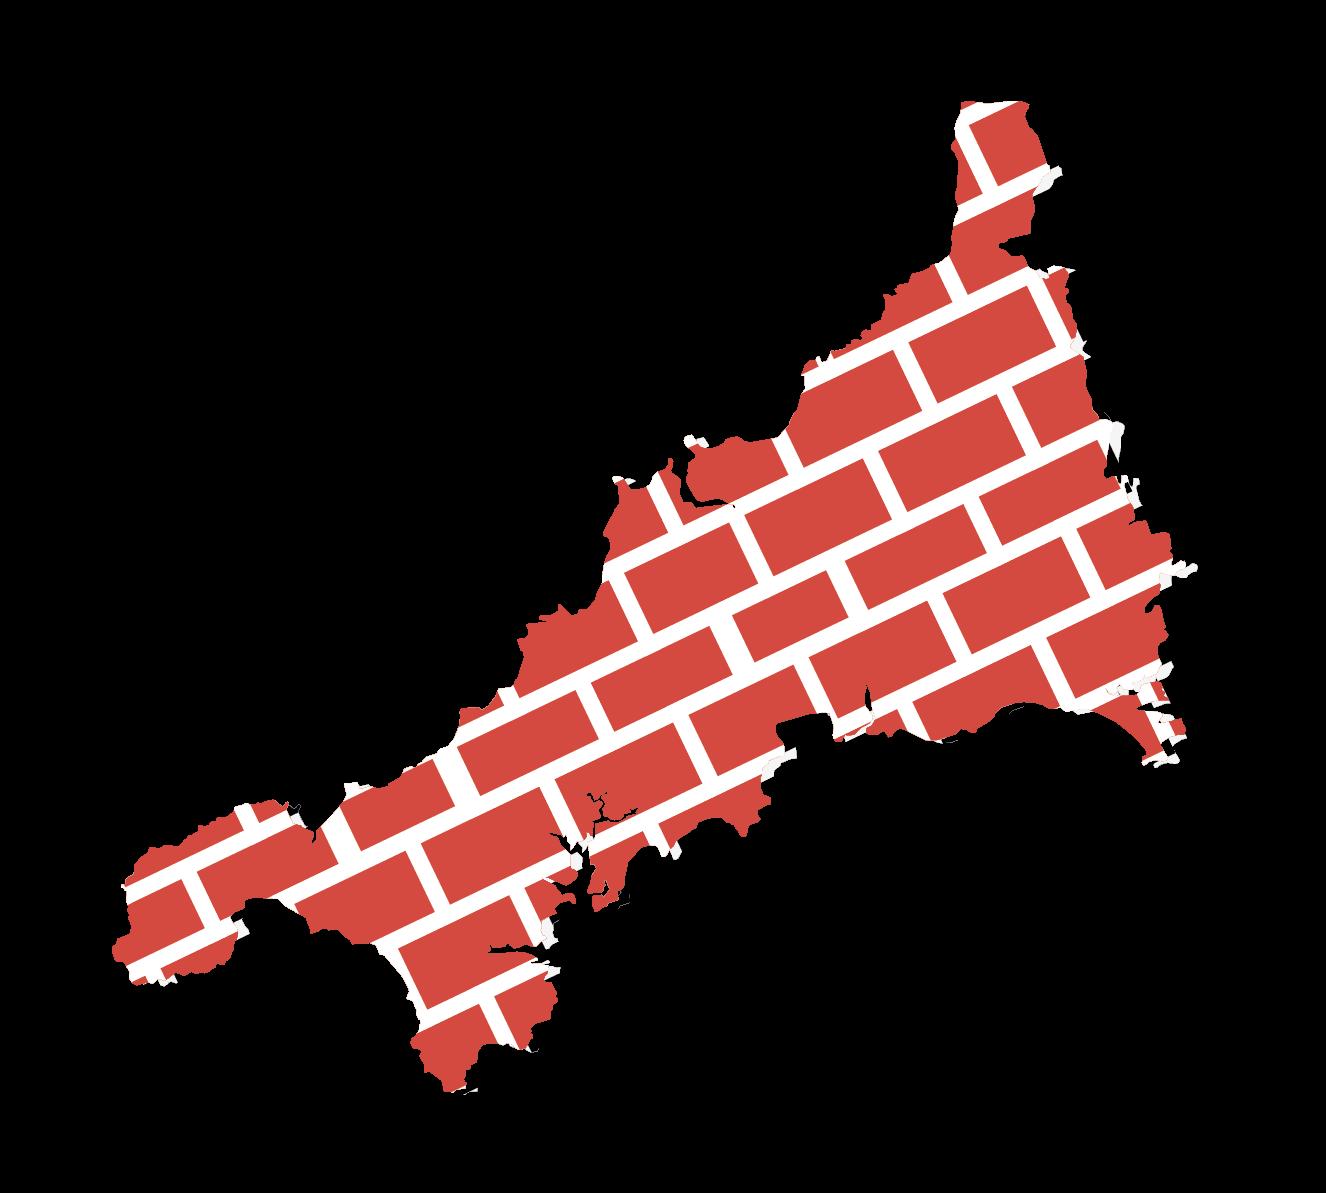 Transp. map